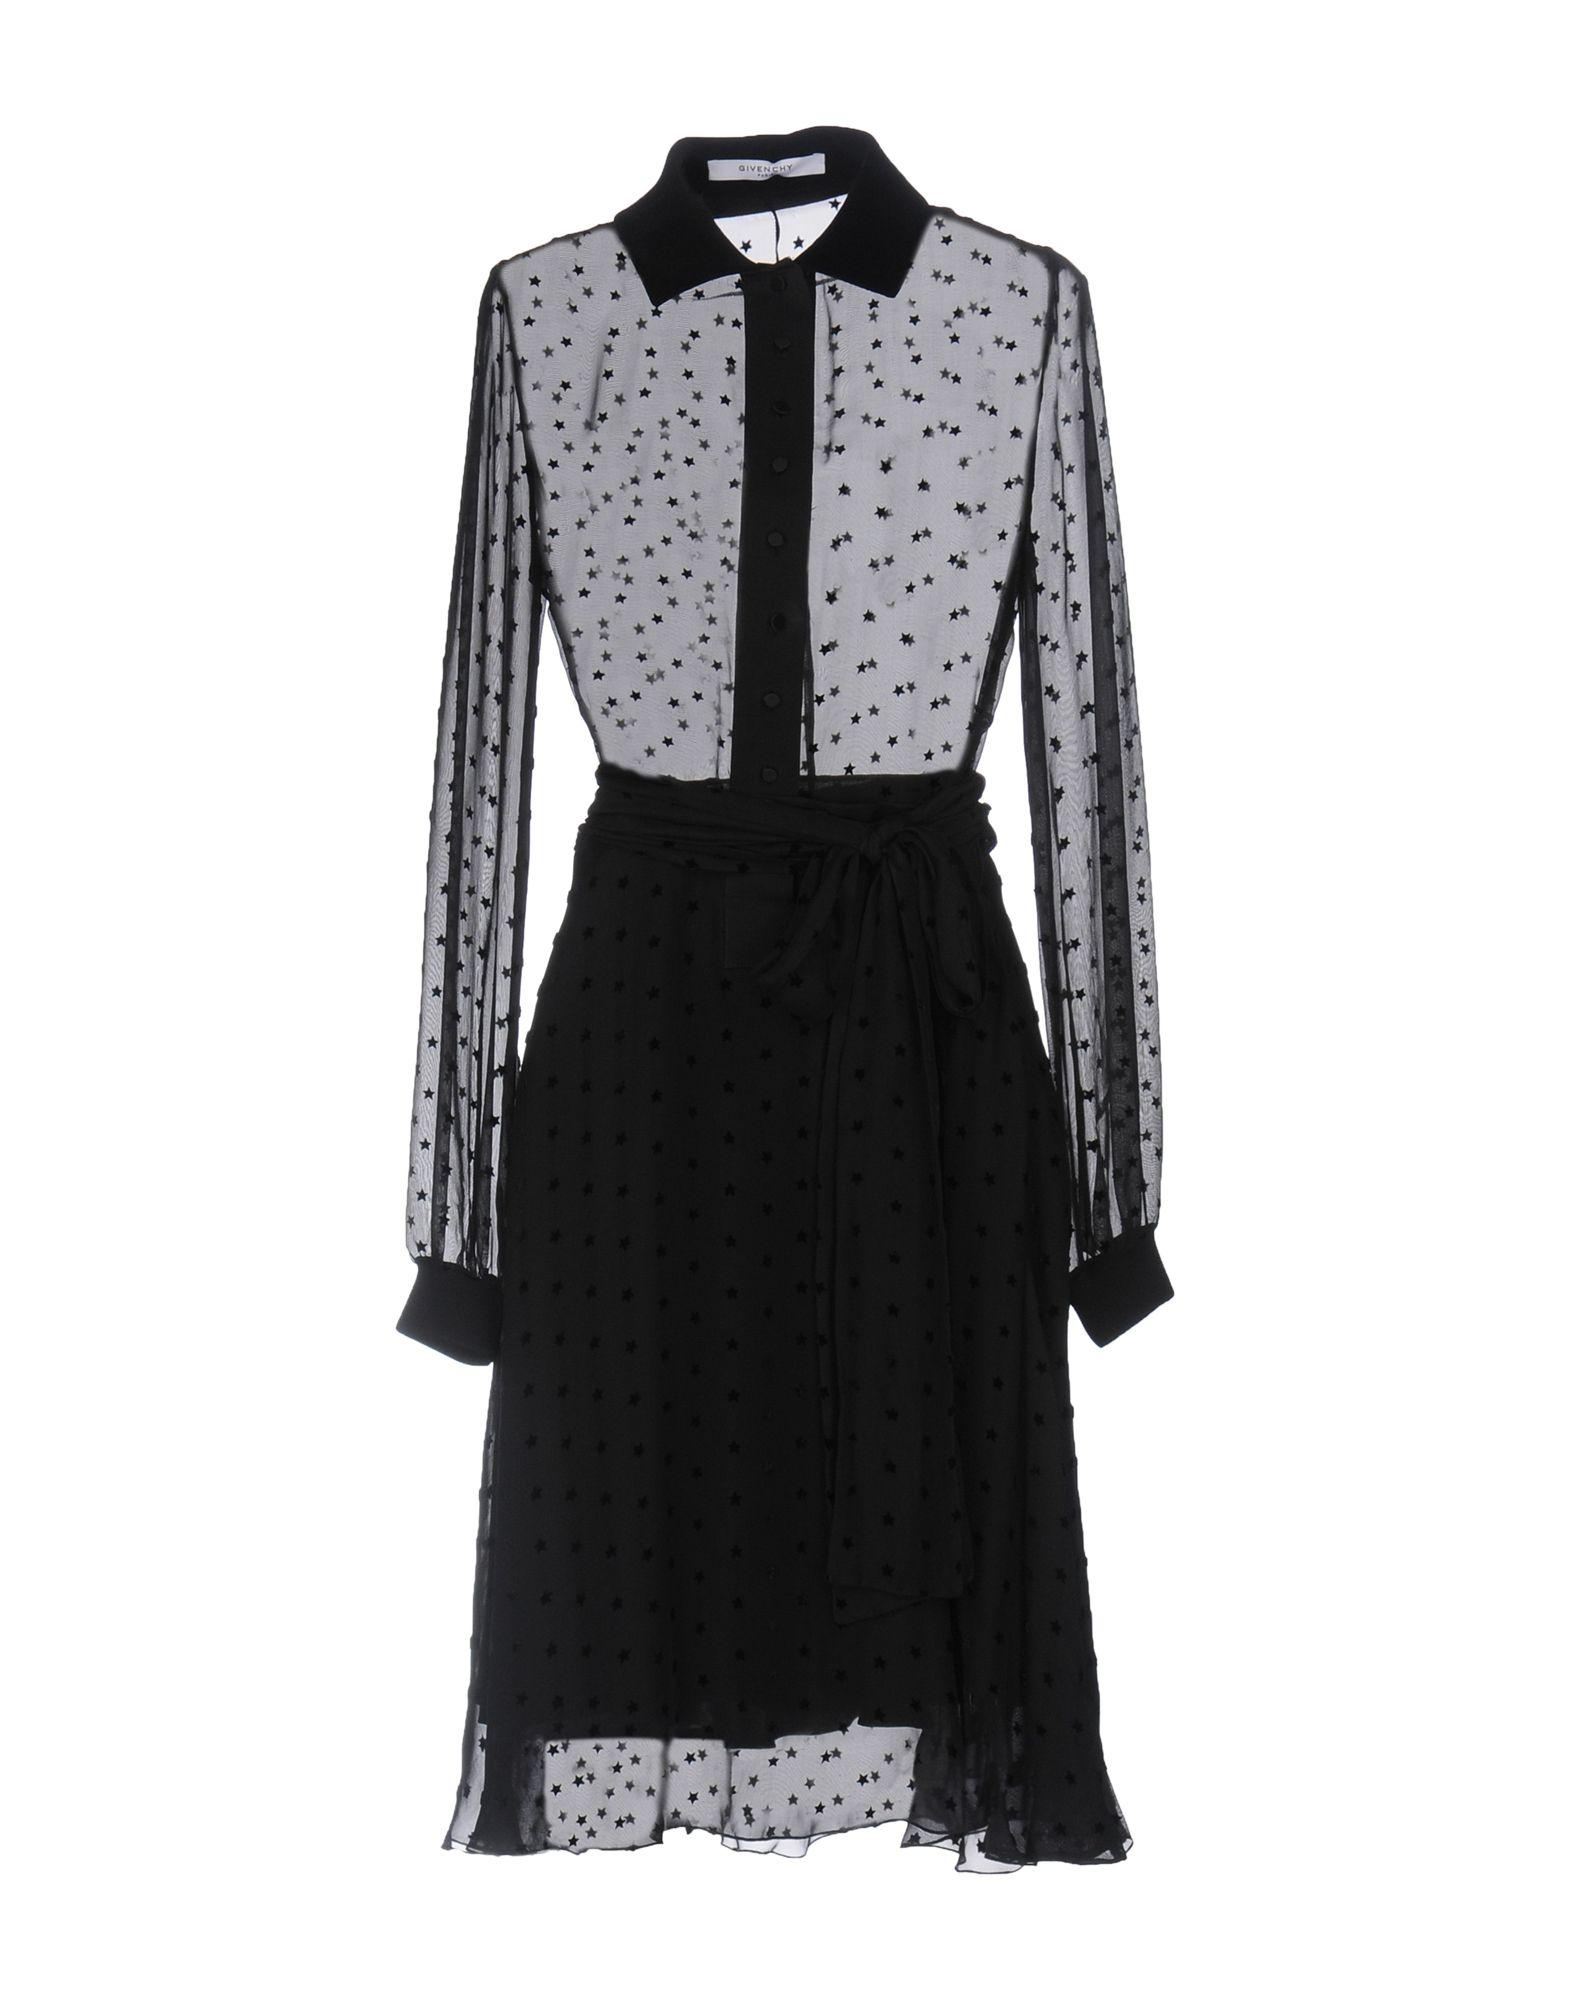 GIVENCHY Короткое платье рубашка givenchy цвет серый черный